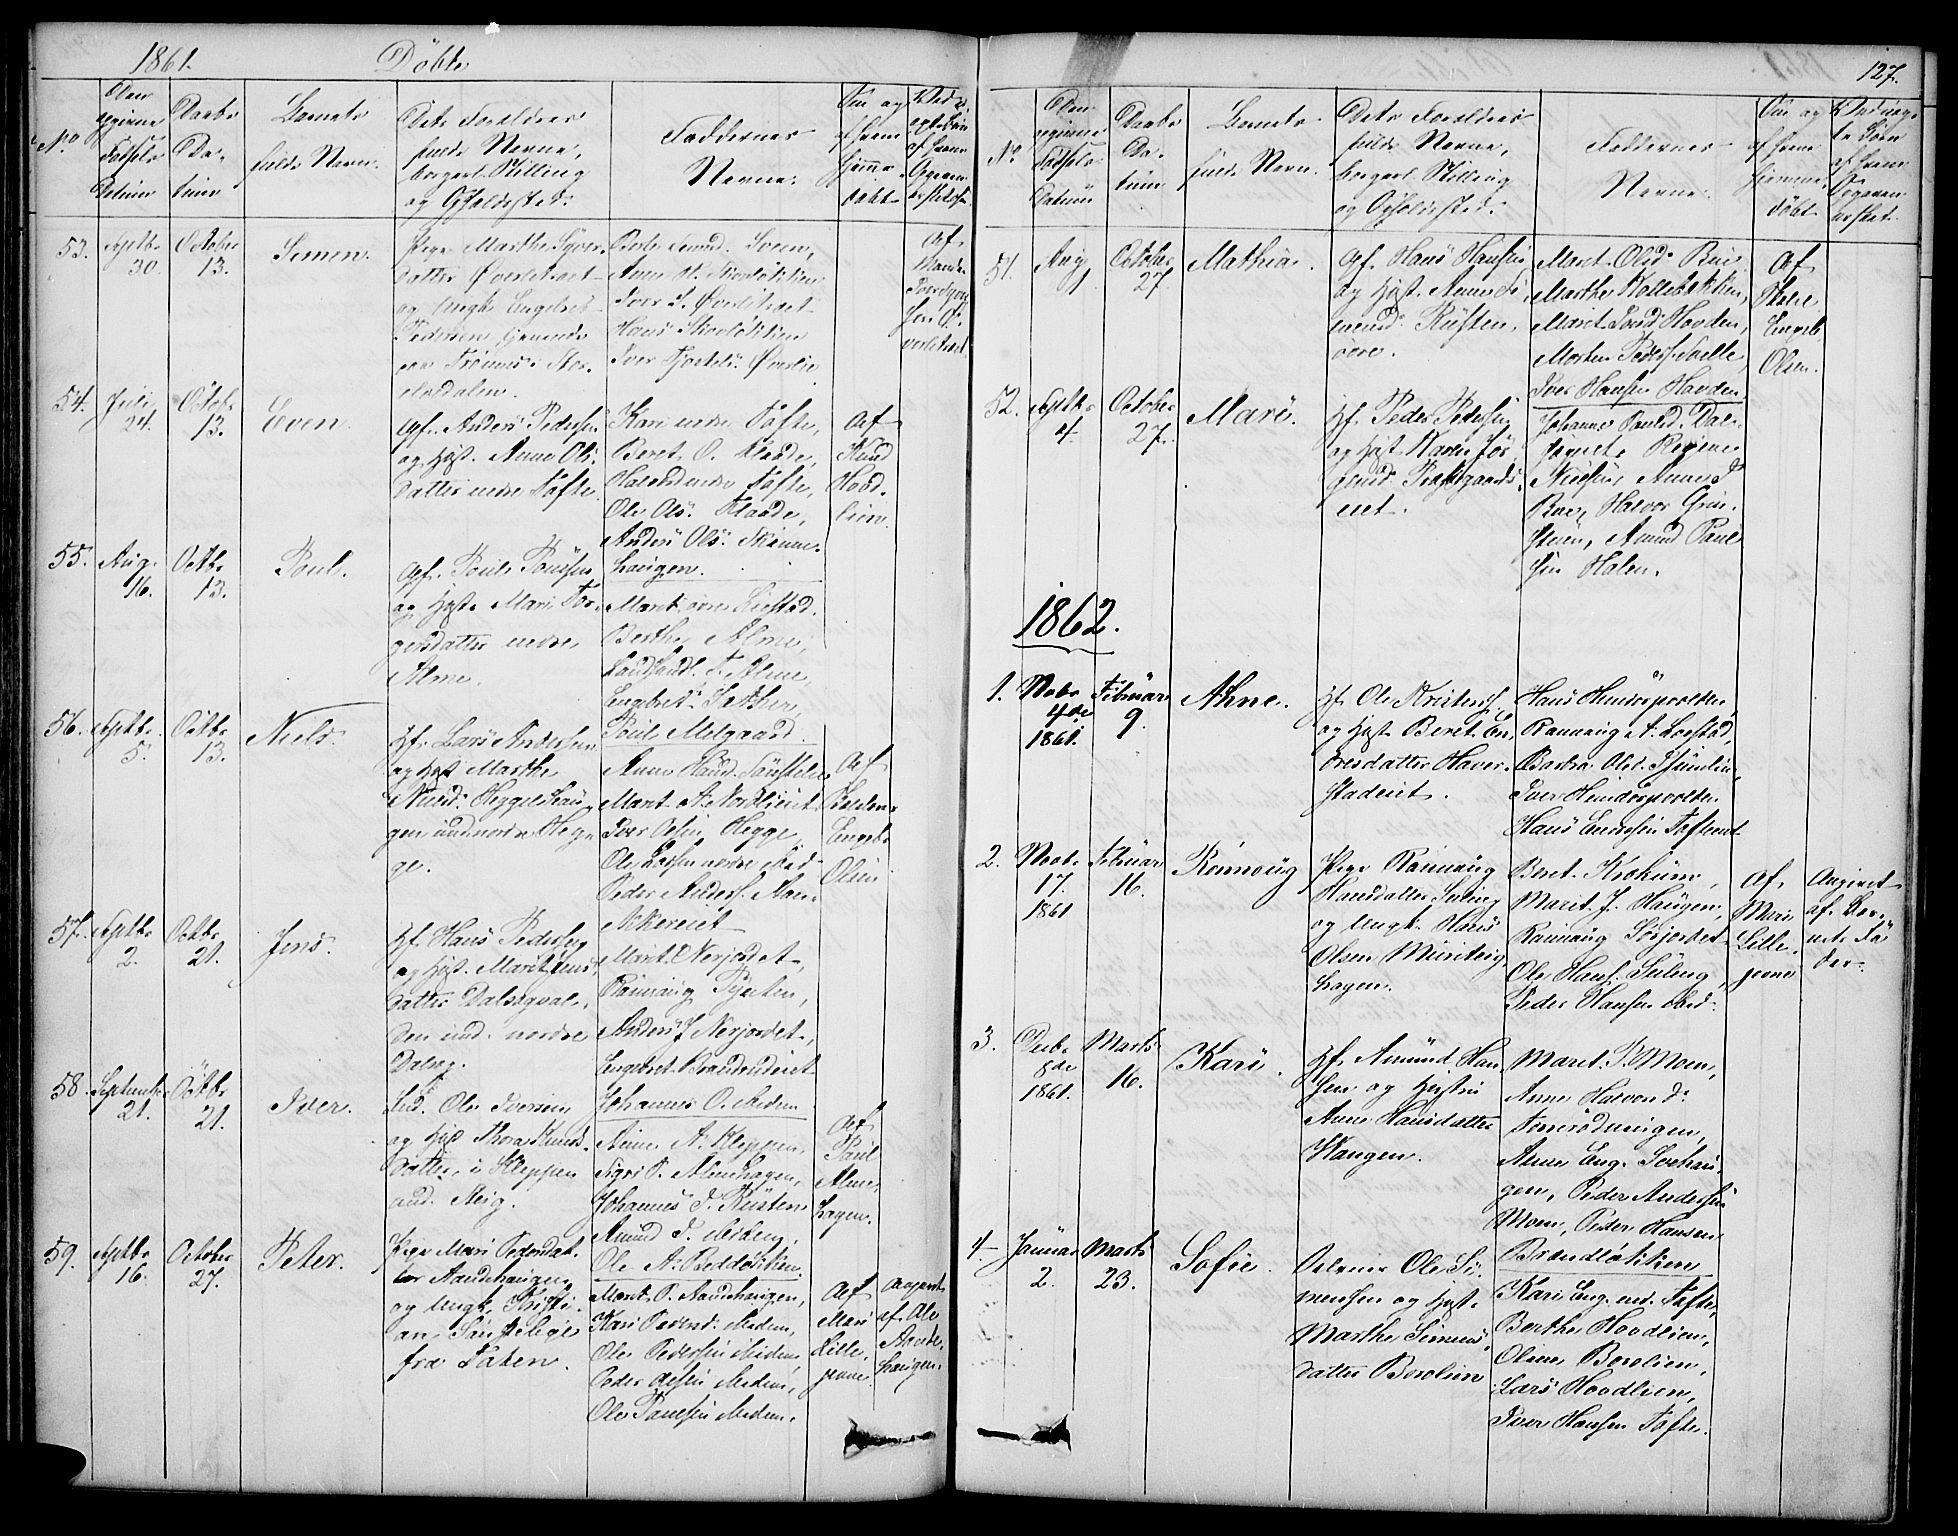 SAH, Sør-Fron prestekontor, H/Ha/Hab/L0001: Klokkerbok nr. 1, 1844-1863, s. 127